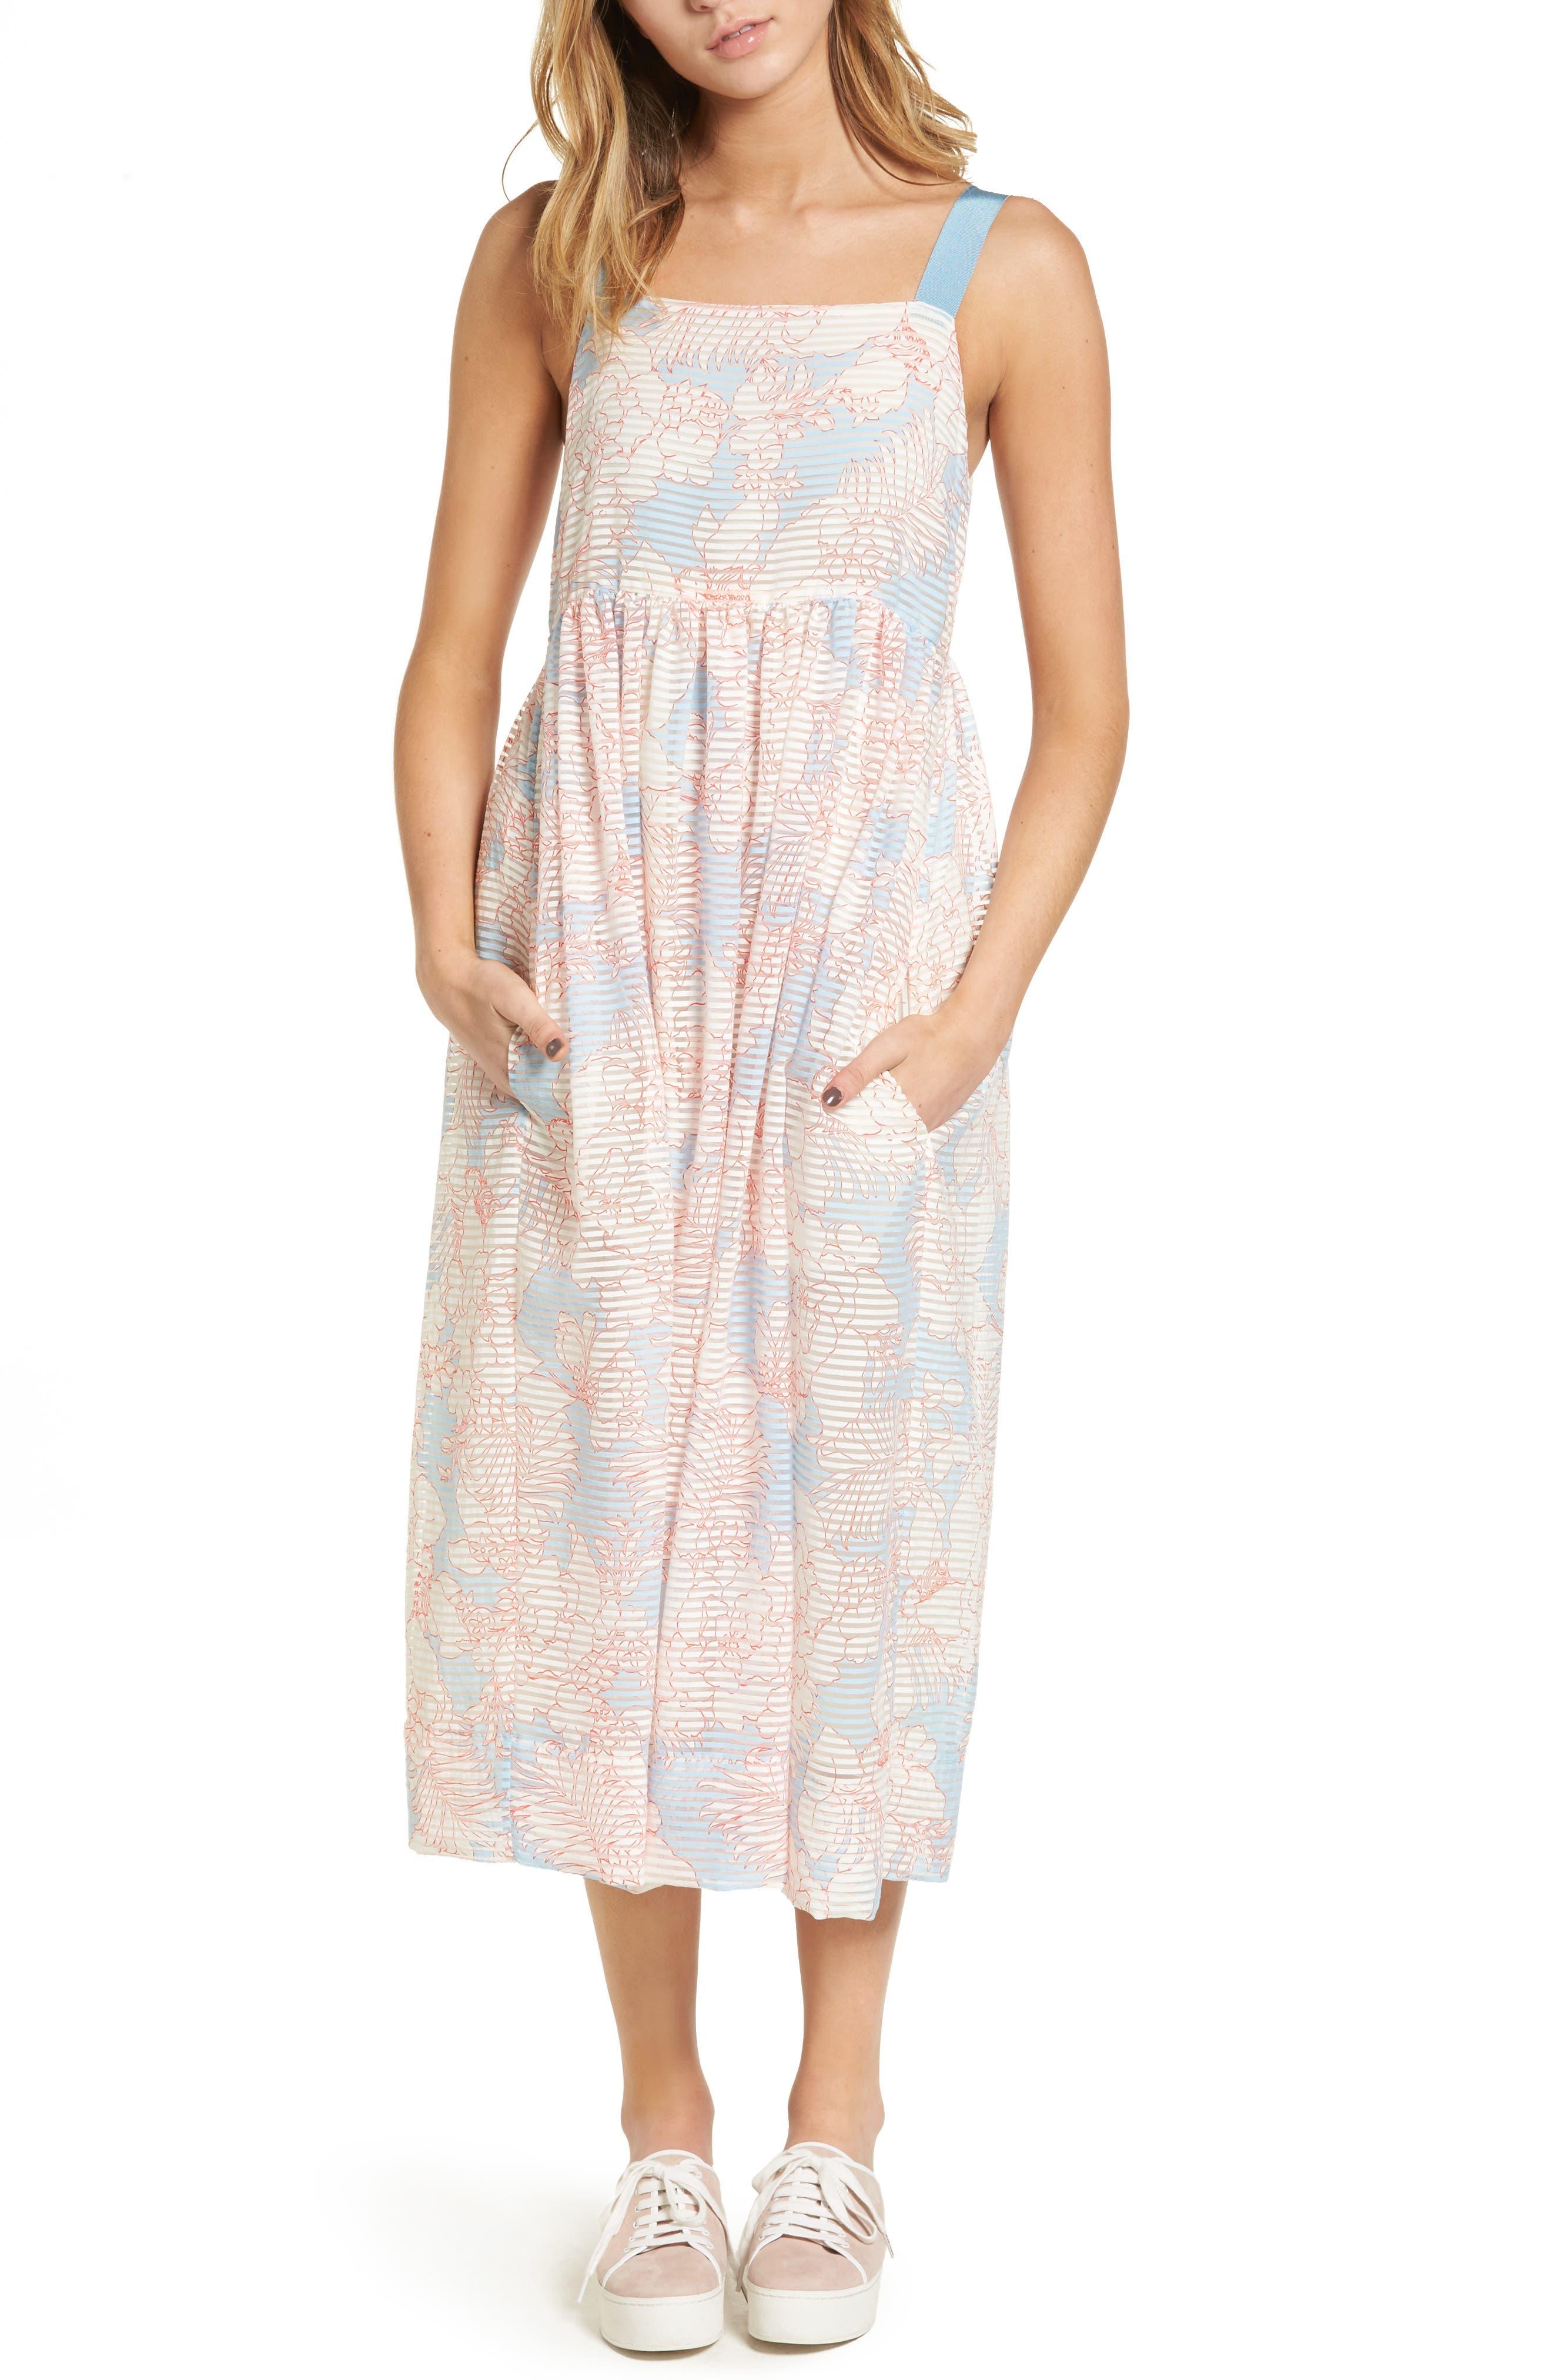 Bahamas Print Midi Dress,                         Main,                         color, 400